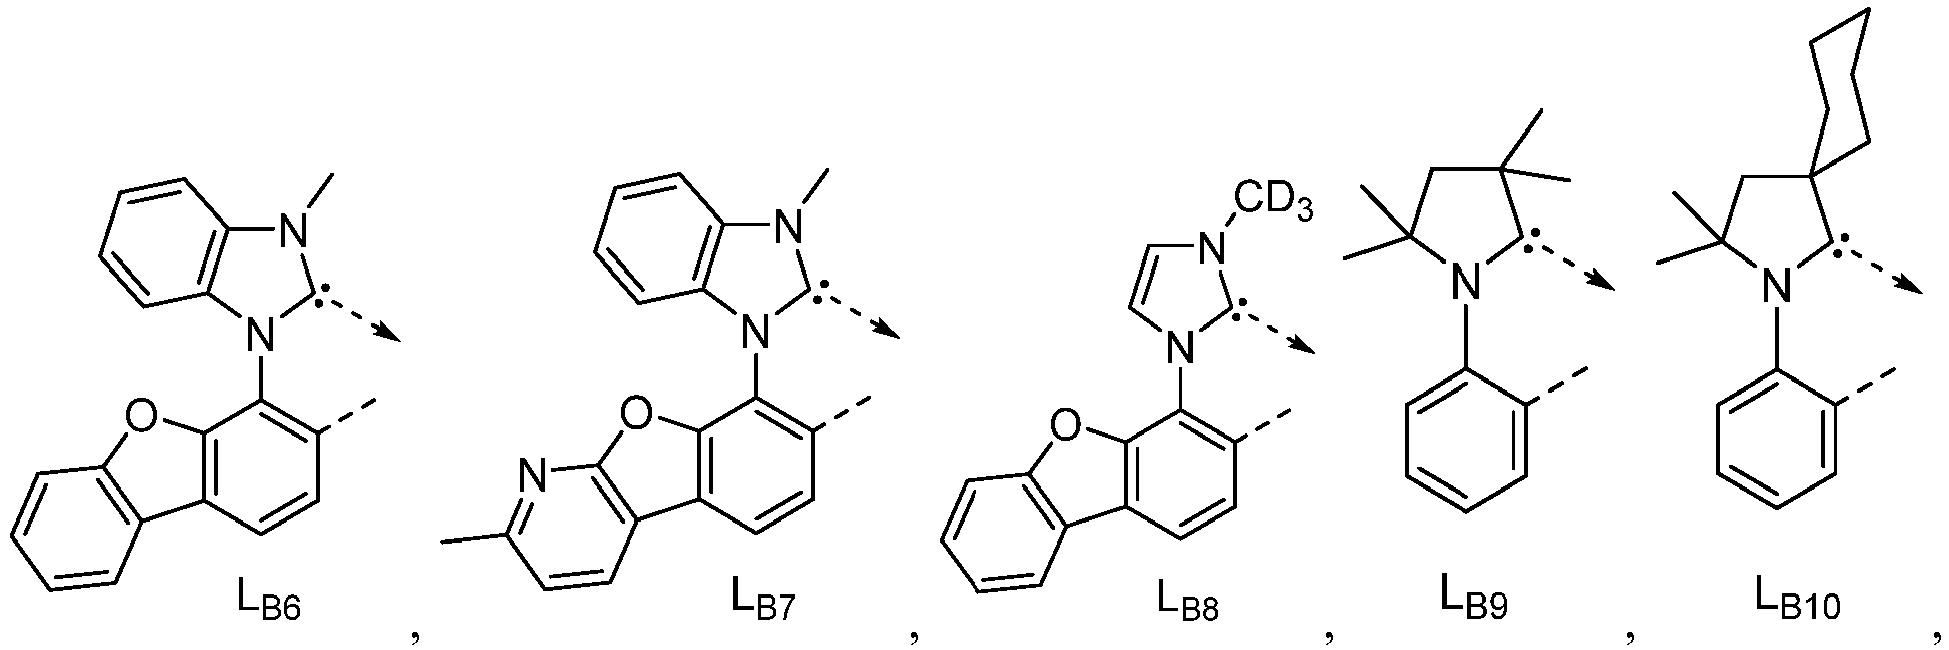 Figure imgb0793